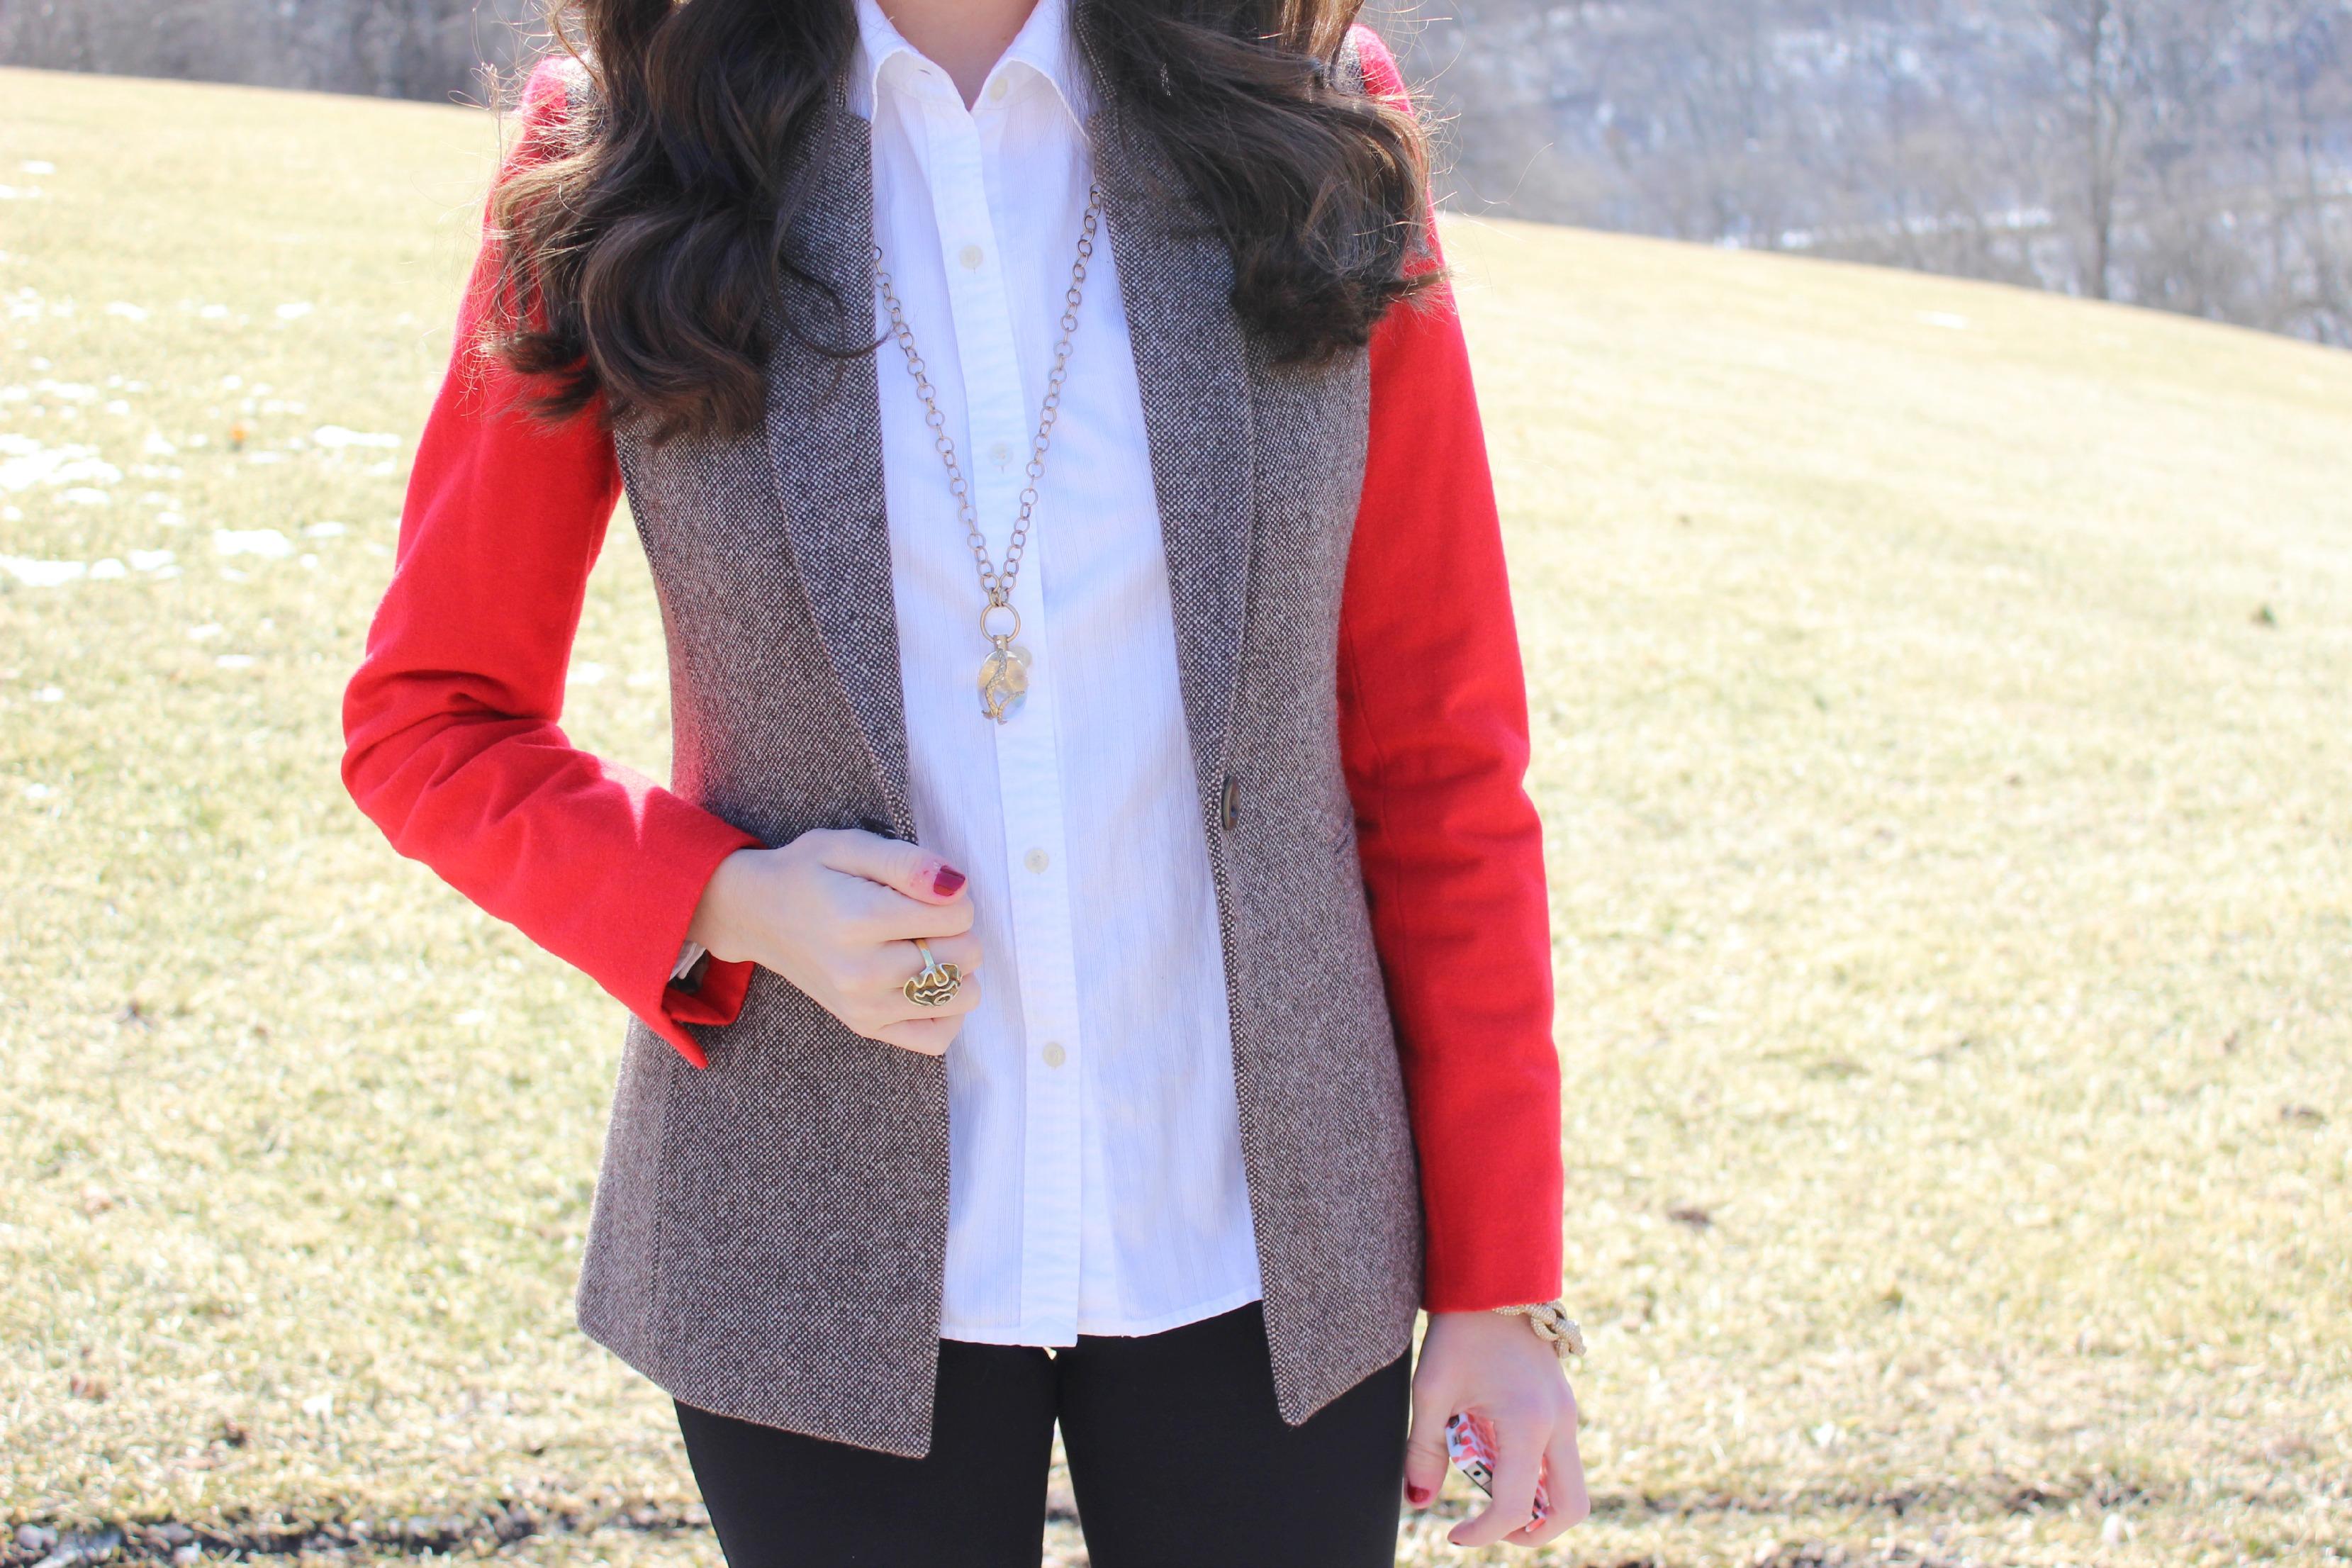 Colorblocked Tweed Blazer with Red Sleeves